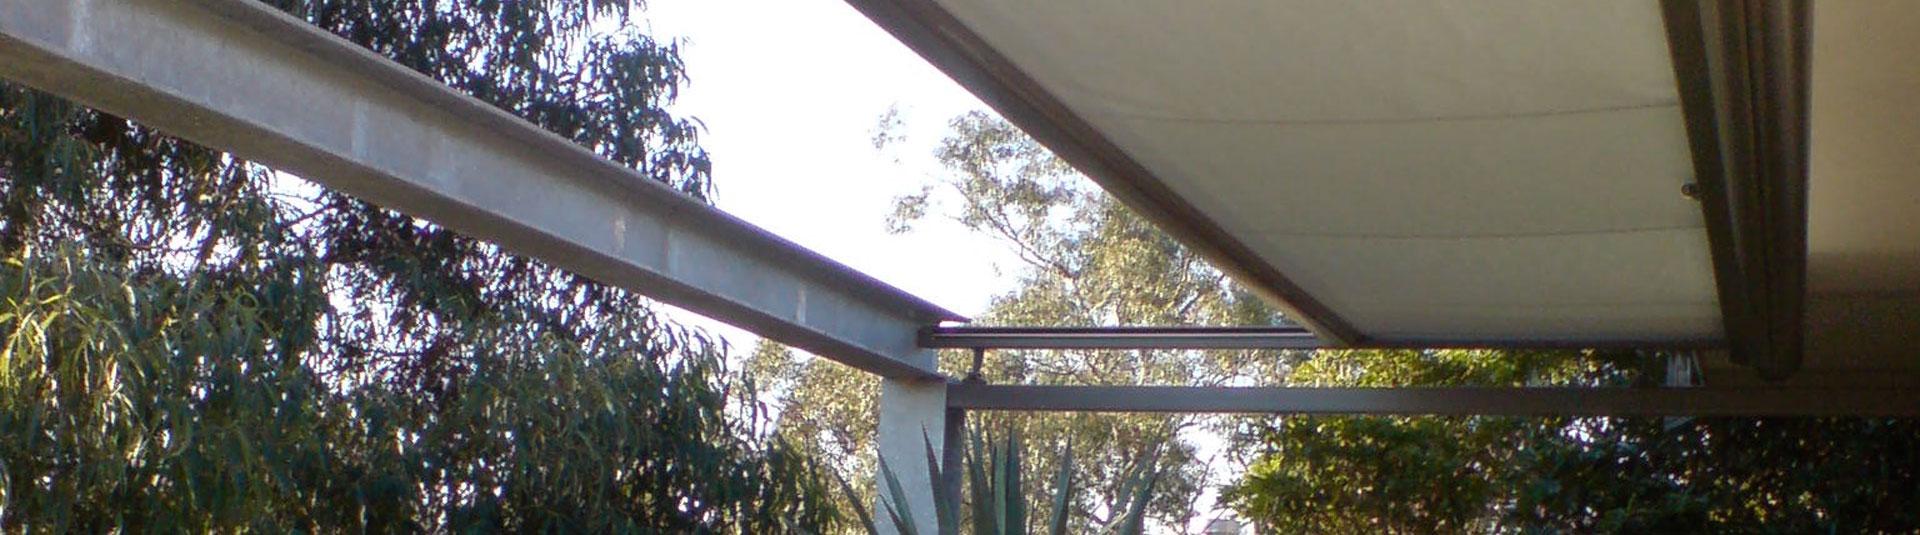 convervatory awnings sydney